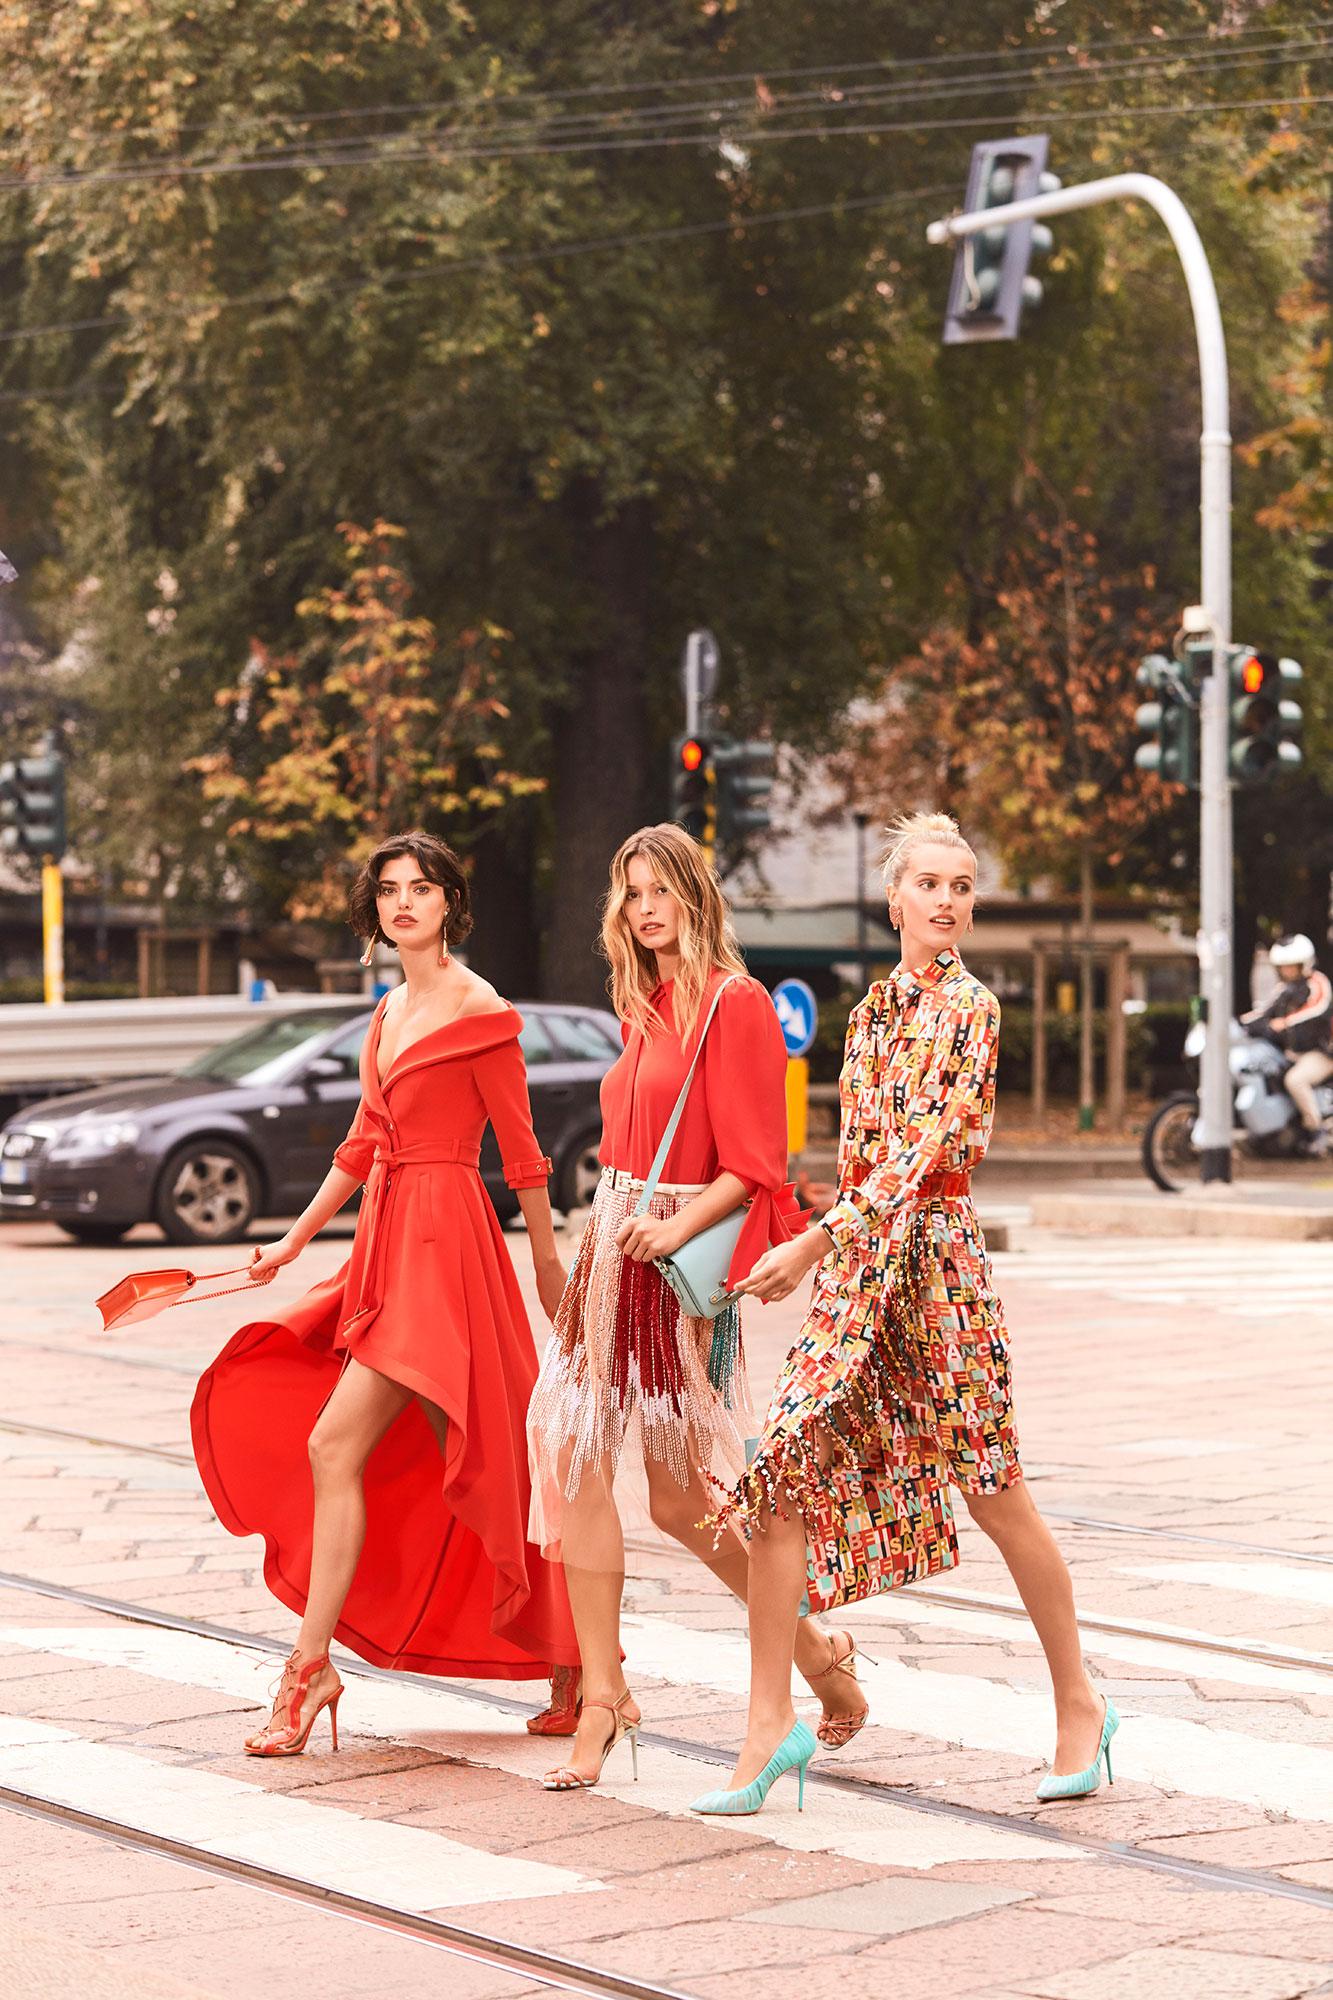 Elisabetta Franchi SS 19 | Andoni & Arantxa | Elisabetta Franchi | Numerique Retouch Photo Retouching Studio